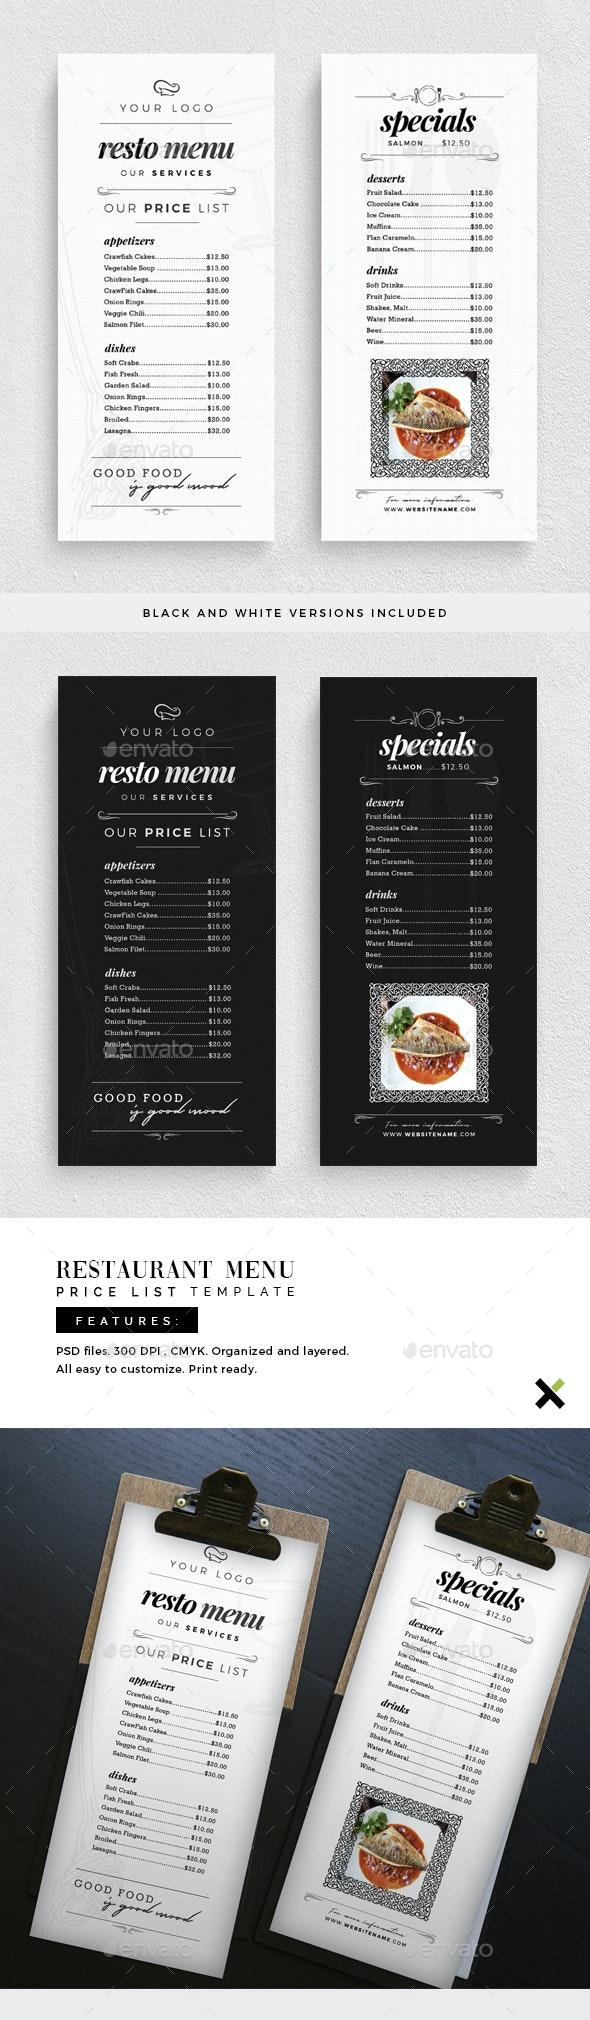 Restaurant Menu Price List Template - Restaurant Flyers